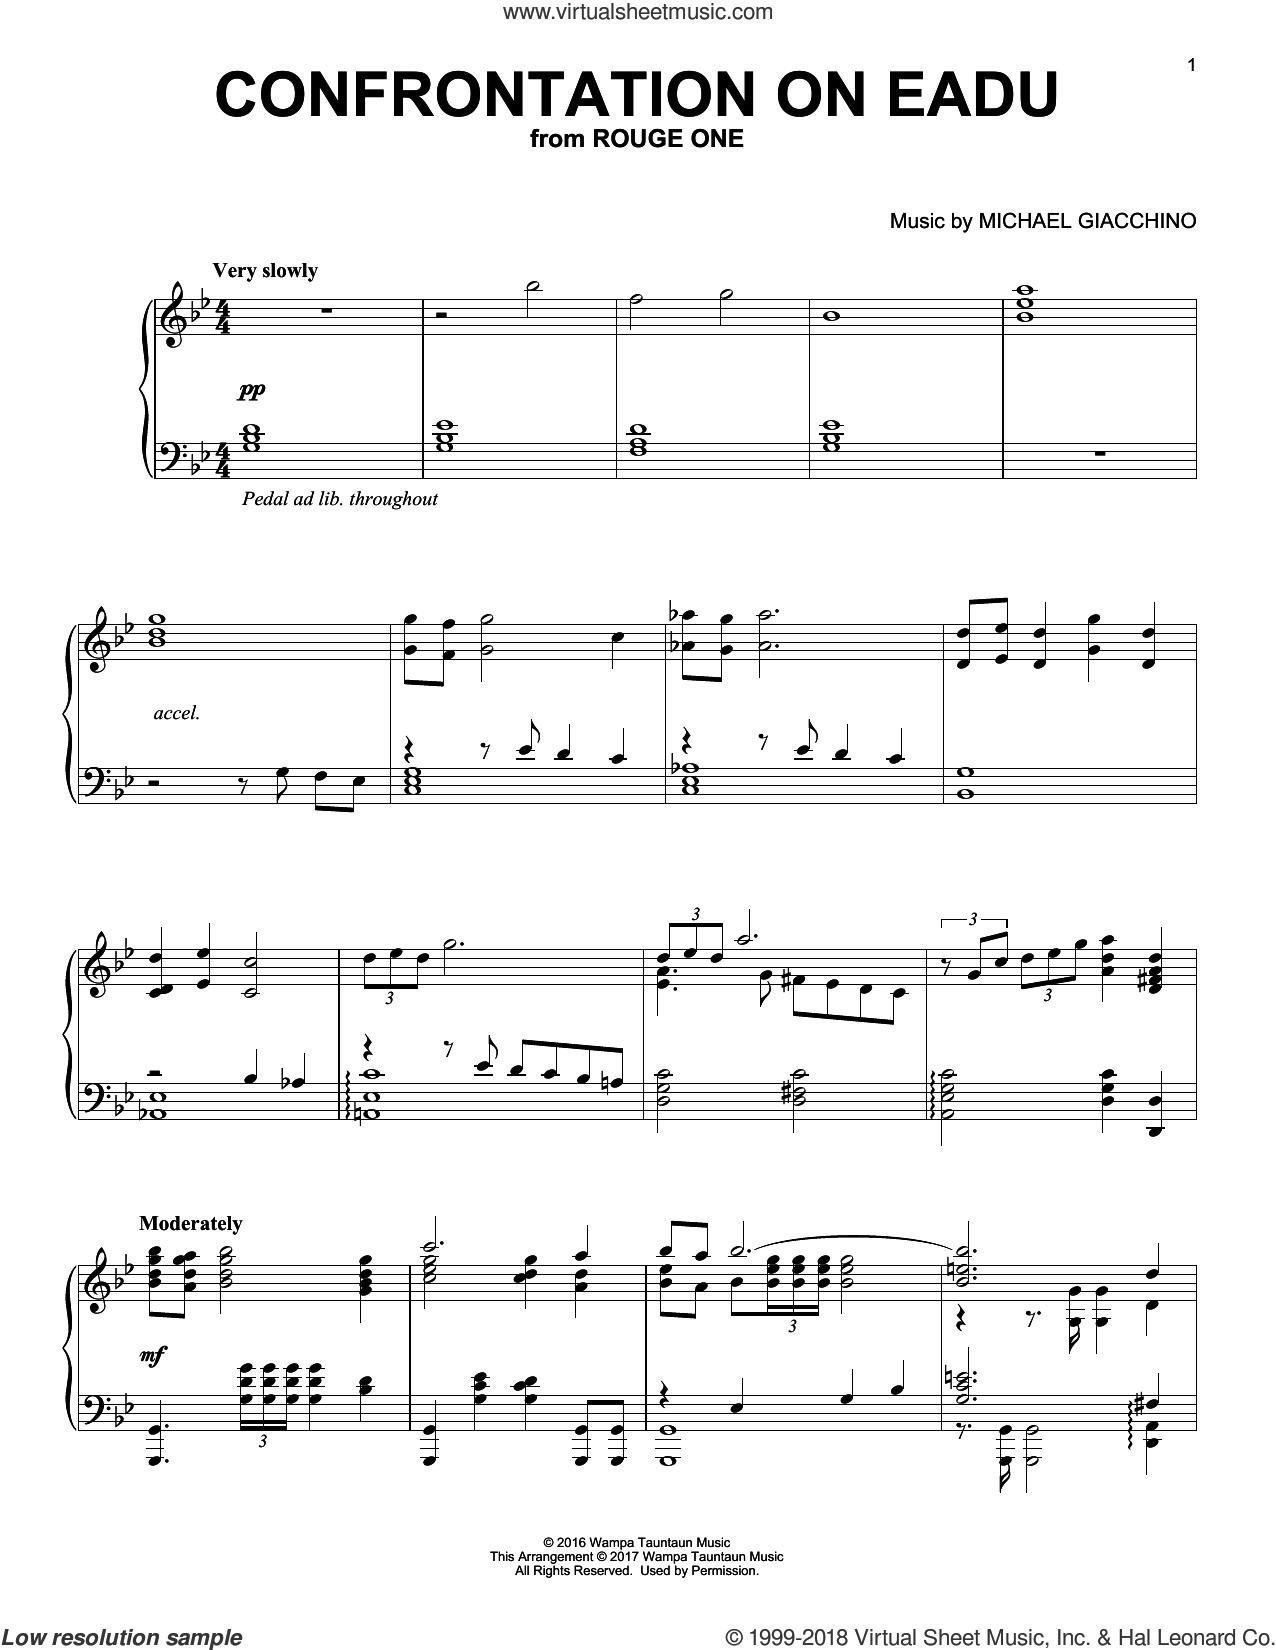 Confrontation On Eadu sheet music for piano solo by Michael Giacchino, classical score, intermediate skill level